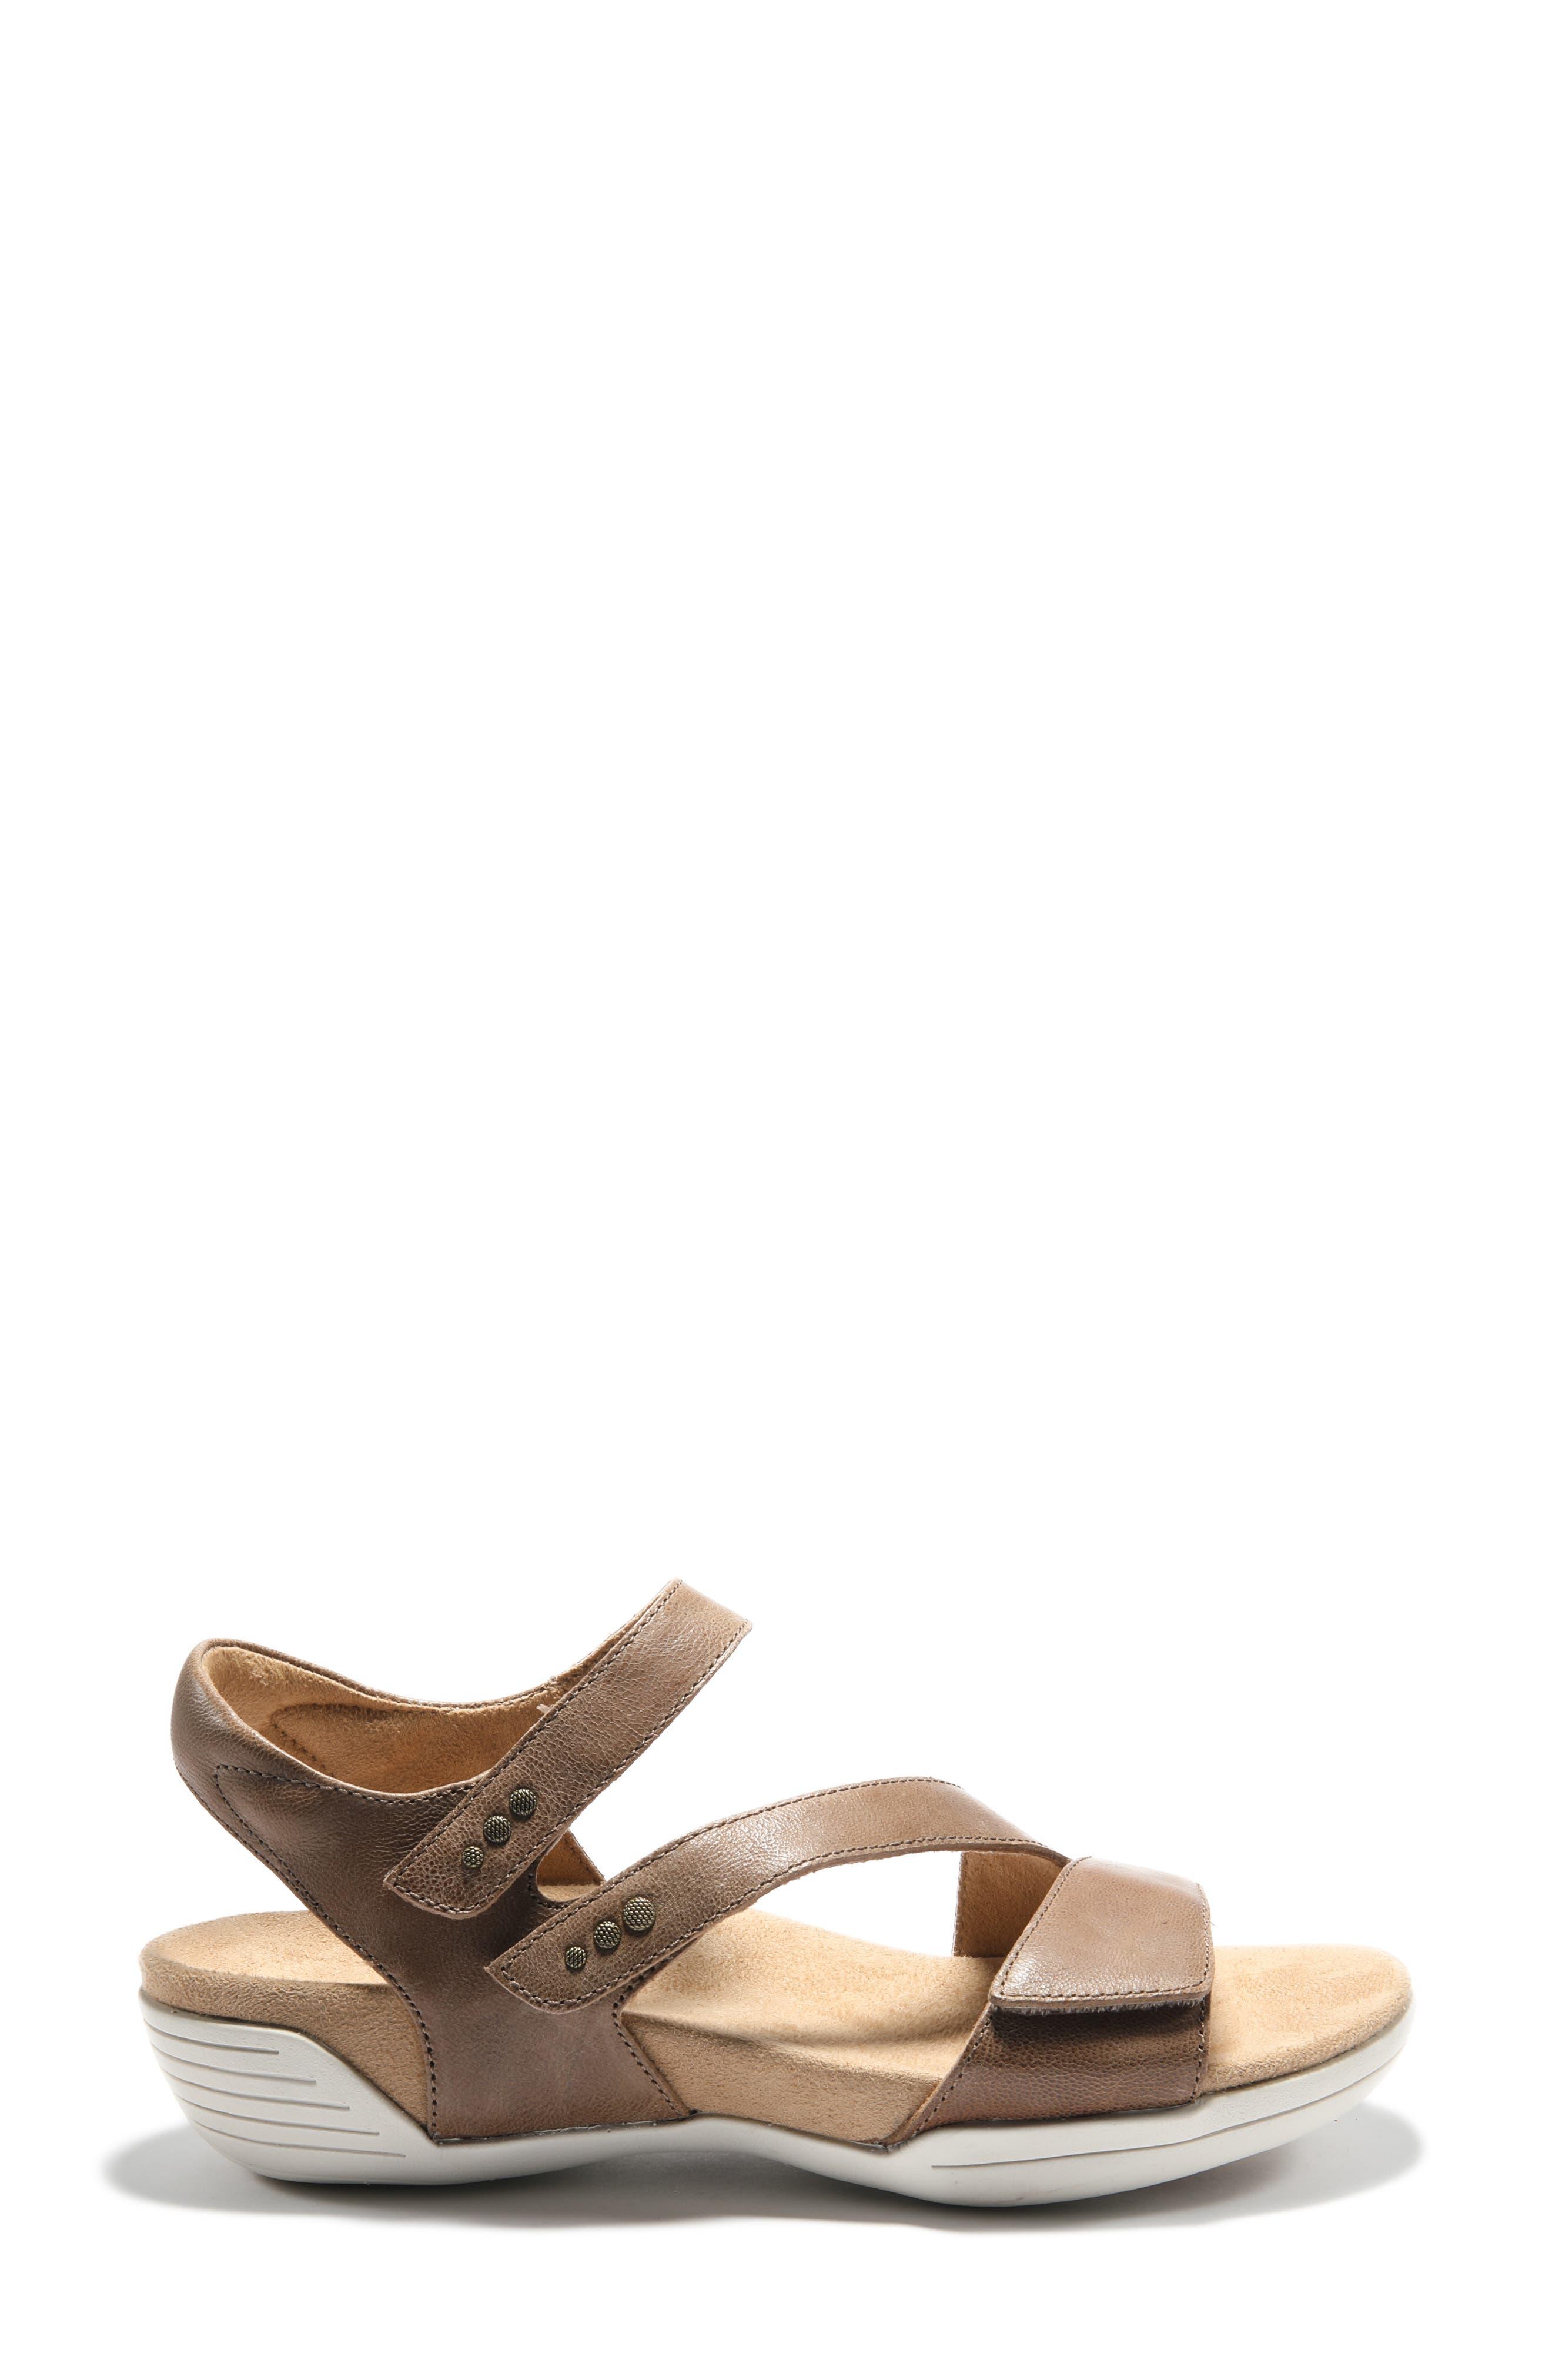 Halsa Footwear Halsa Denia Ankle Strap Sandal